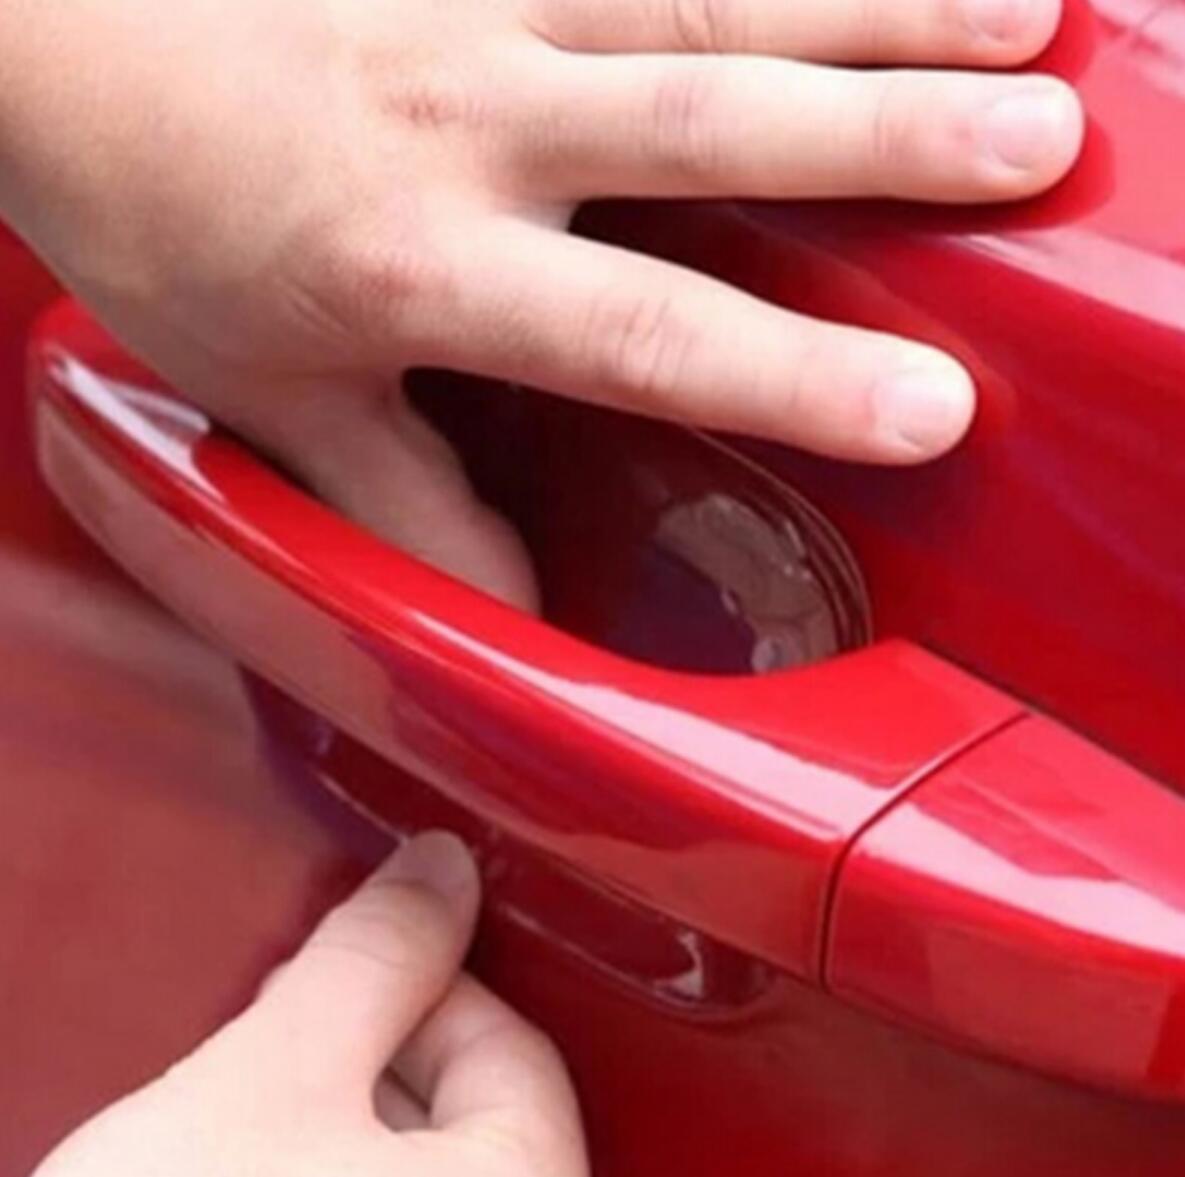 4 шт. Автомобиль дверная ручка Защитная клеящеяся пленка для автомобиля для Mazda 2 3 5 6 CX-3 CX-4 CX-5 CX5 CX-7 CX-9 Atenza Axela